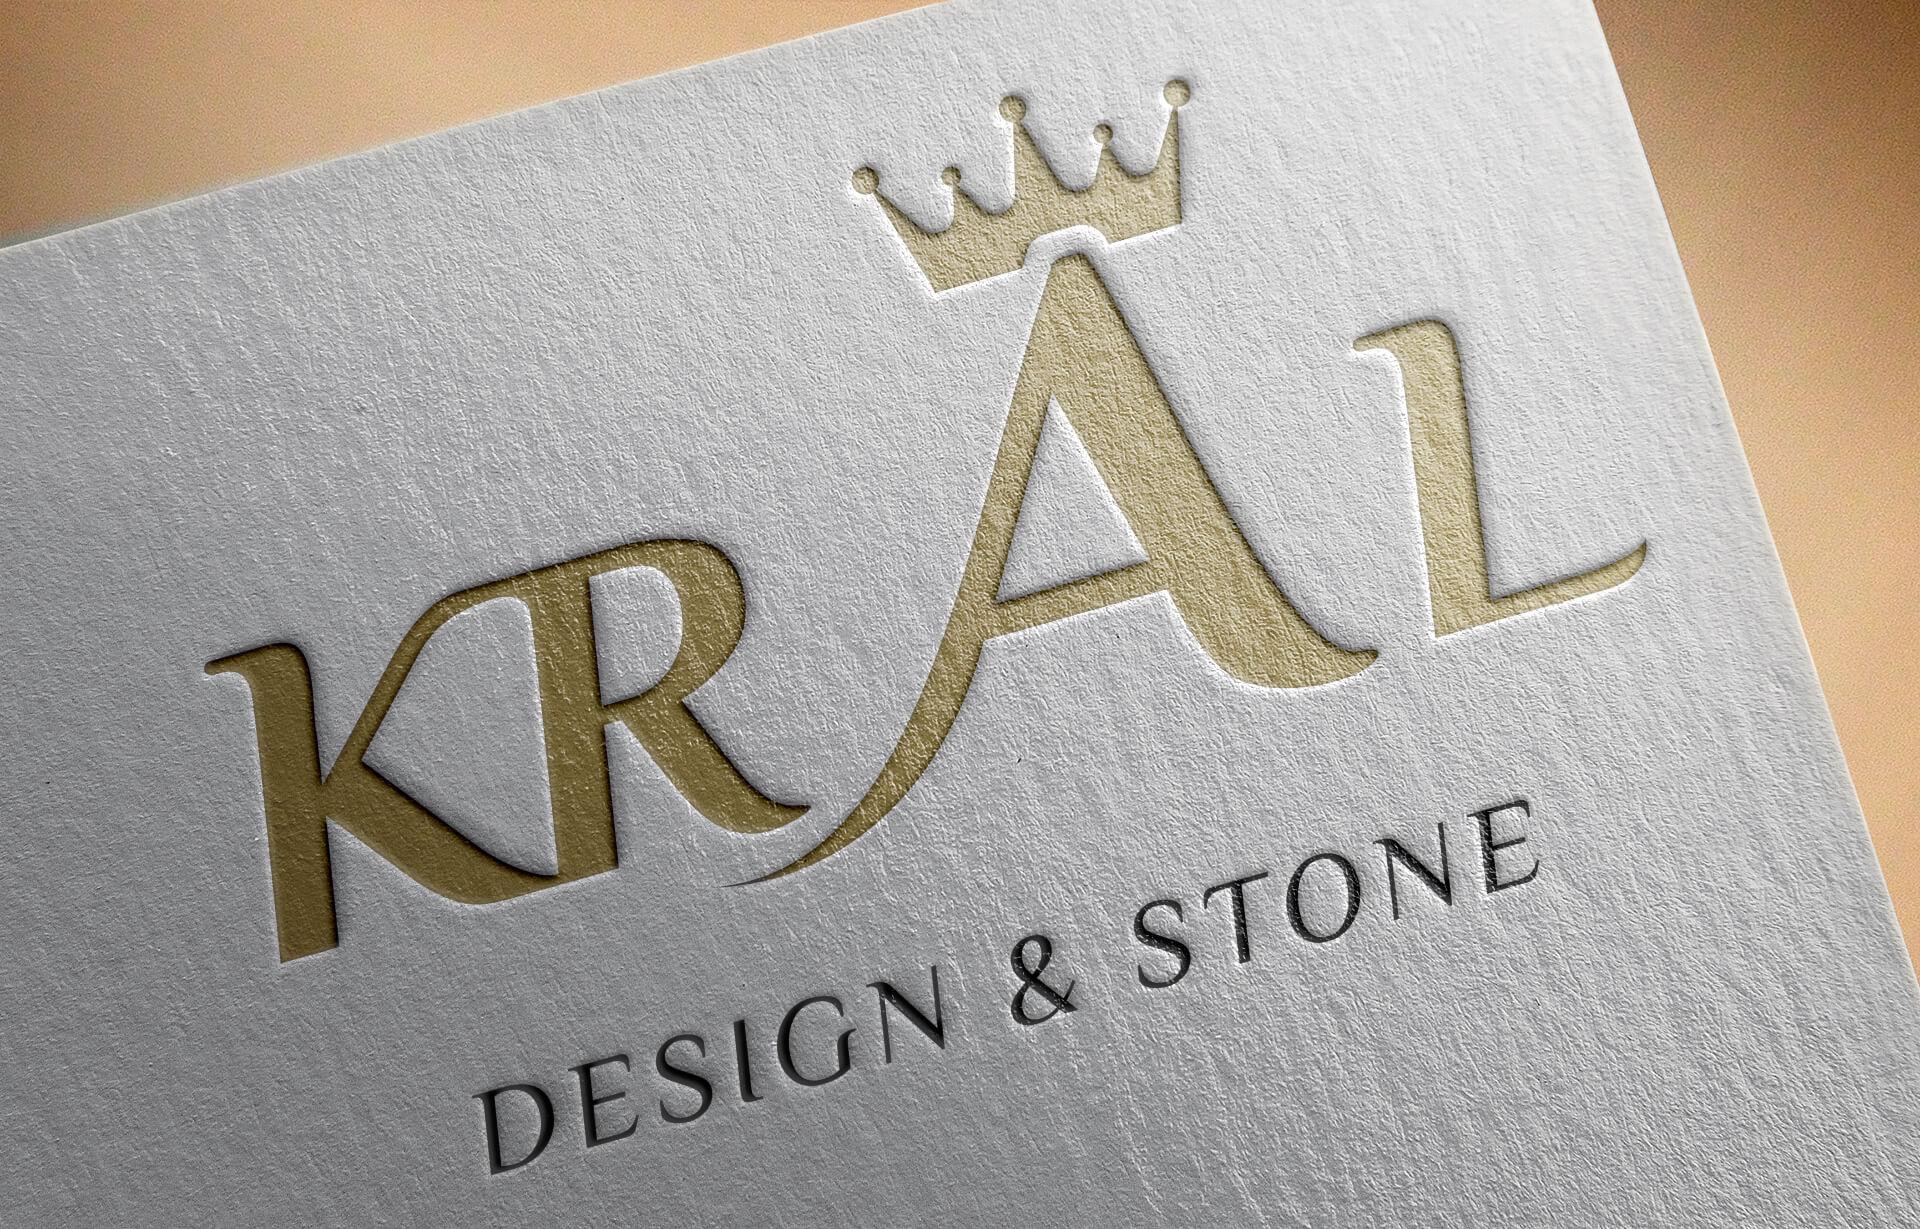 Kral | Design & Stone